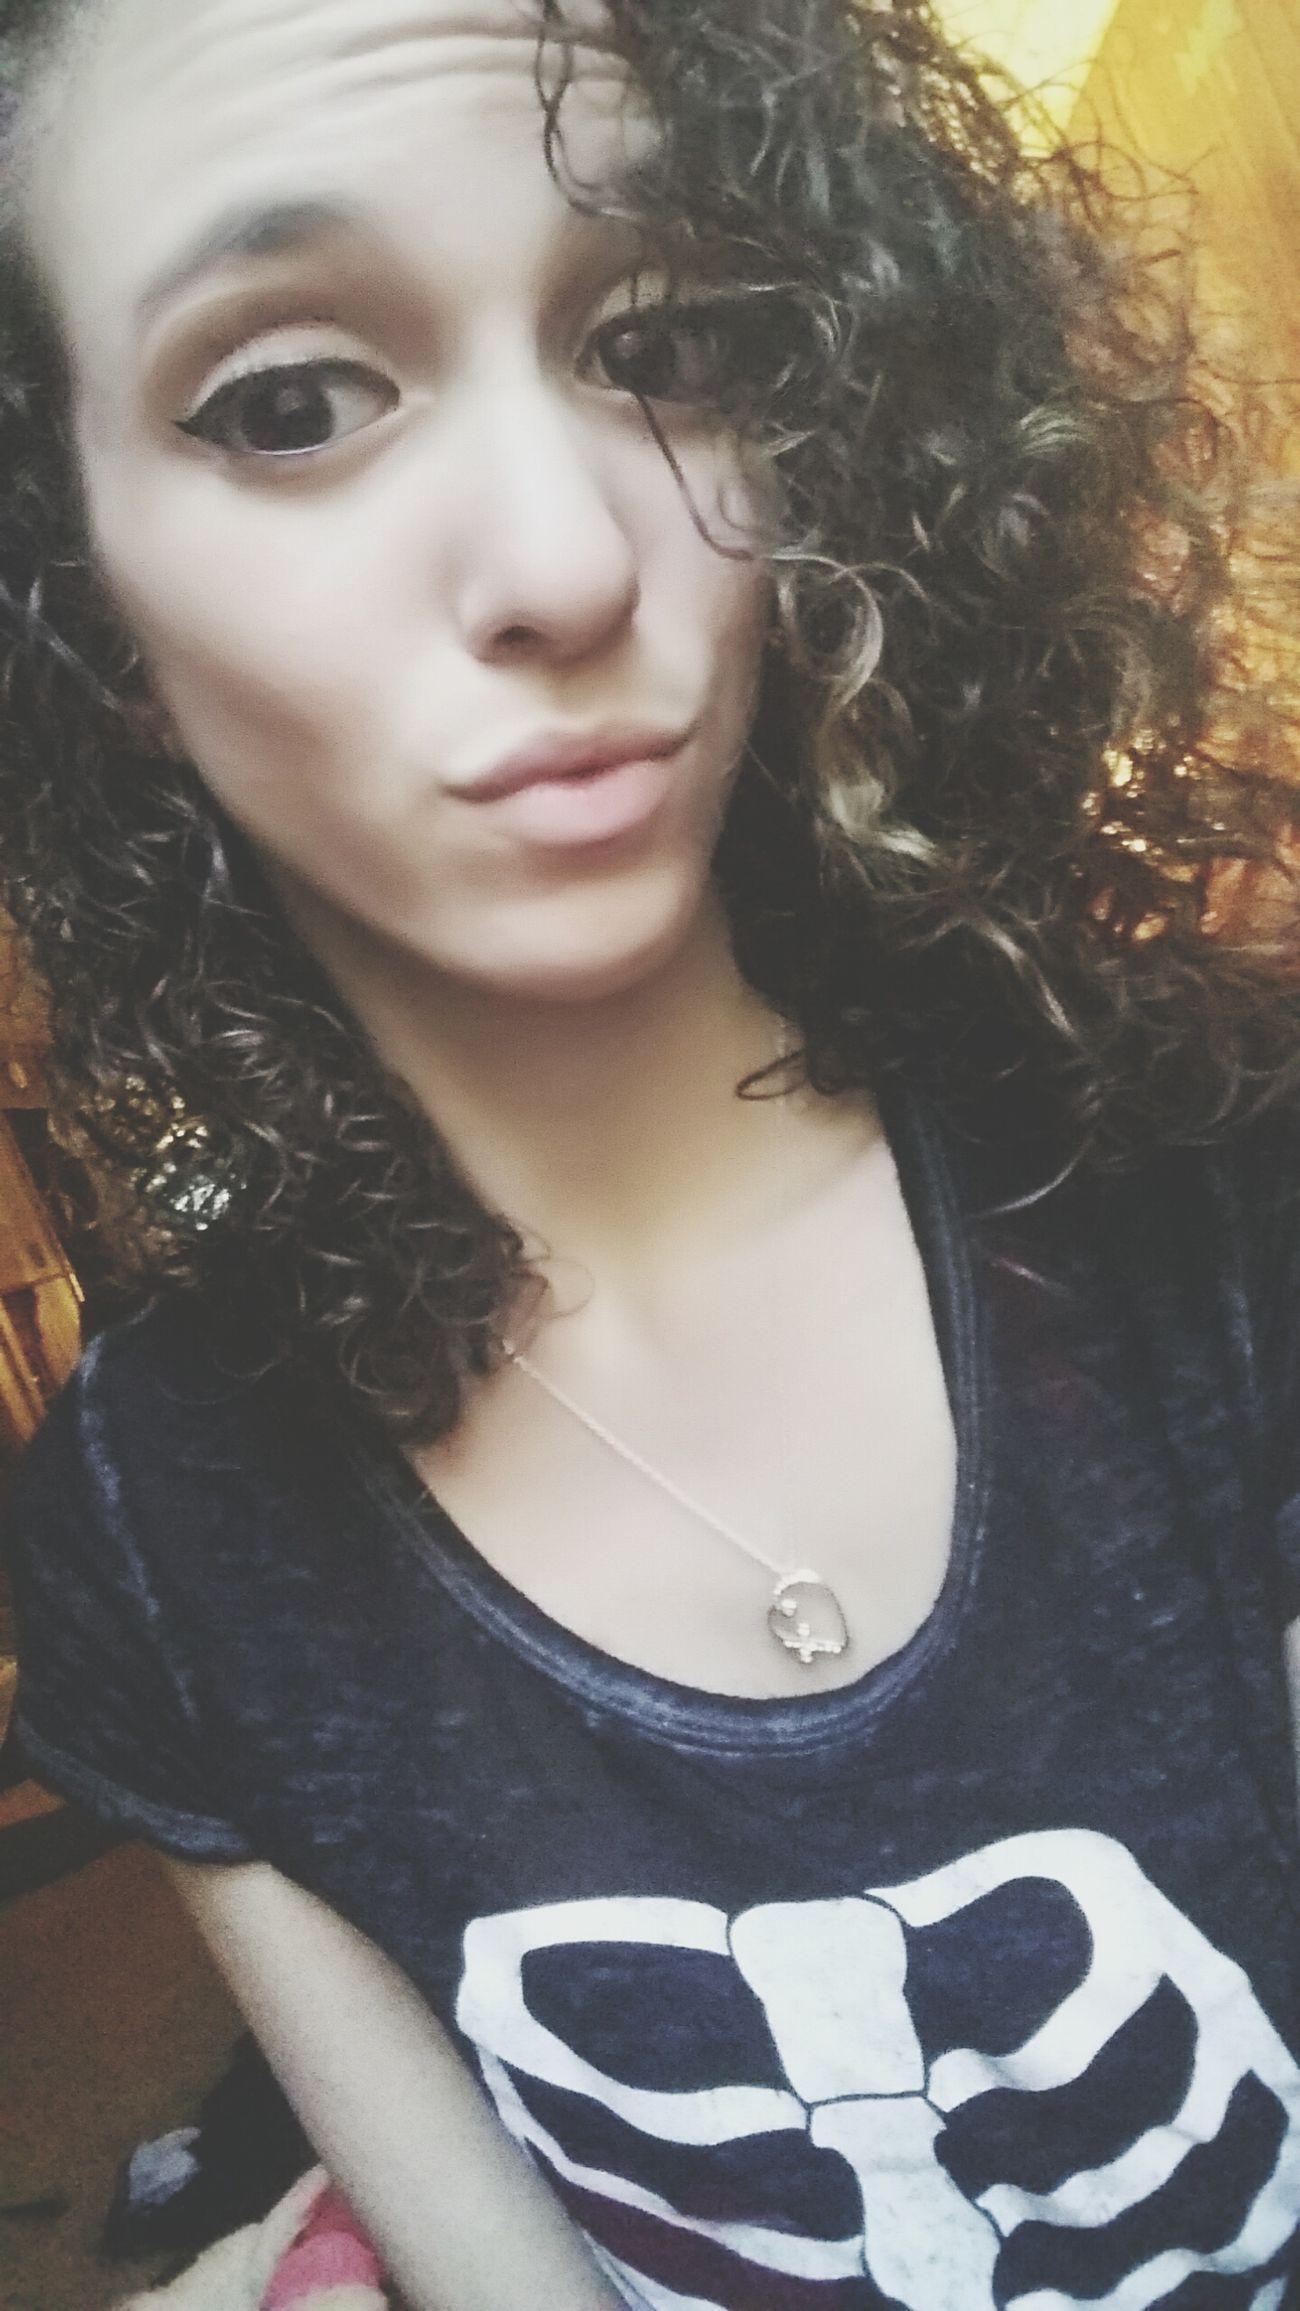 💋 Girls Selfie Likeforlike Followforfollow Like4like Instagood Girlswithtattoos Instalike Follow4follow Instafollow Semperfi Snapchat Me!  ChicksWithInk 20160119 Cheese! Whaddddup Selfie✌ Futuremarine Femalemarines